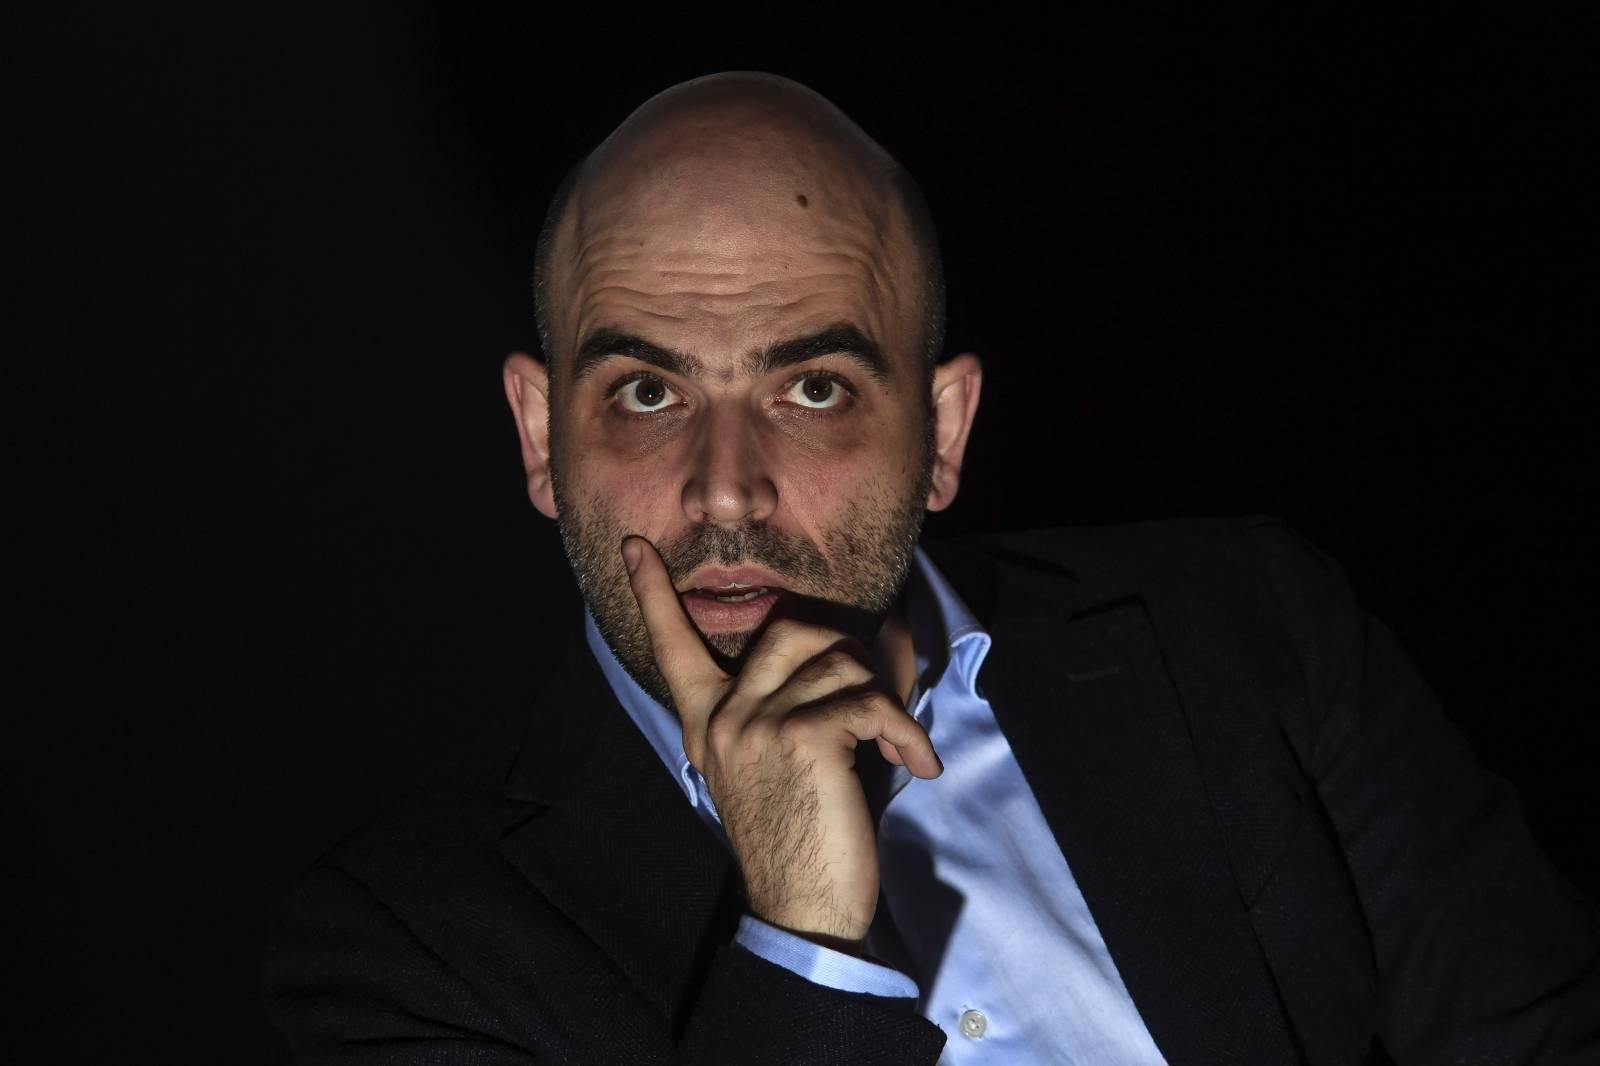 Roberto Saviano at the presentation of the film the children's paranza